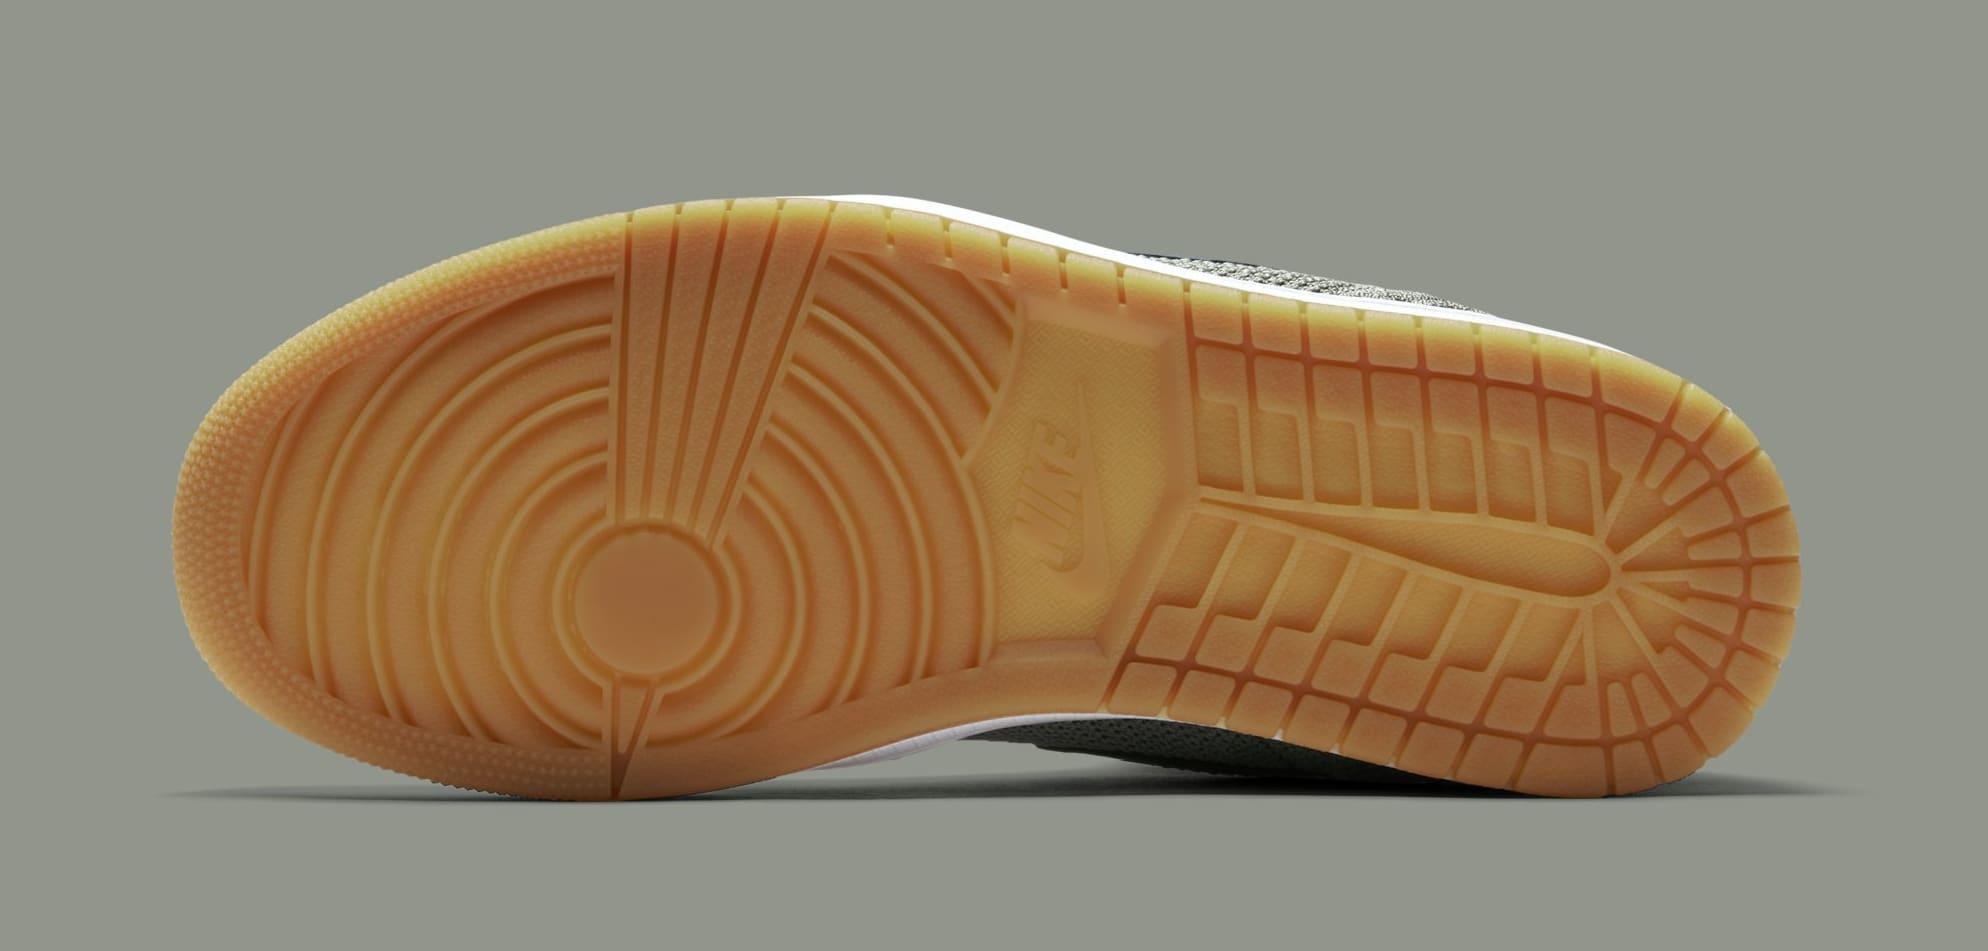 Air Jordan 1 Flyknit 'Clay Green' 919704-333 (Bottom)